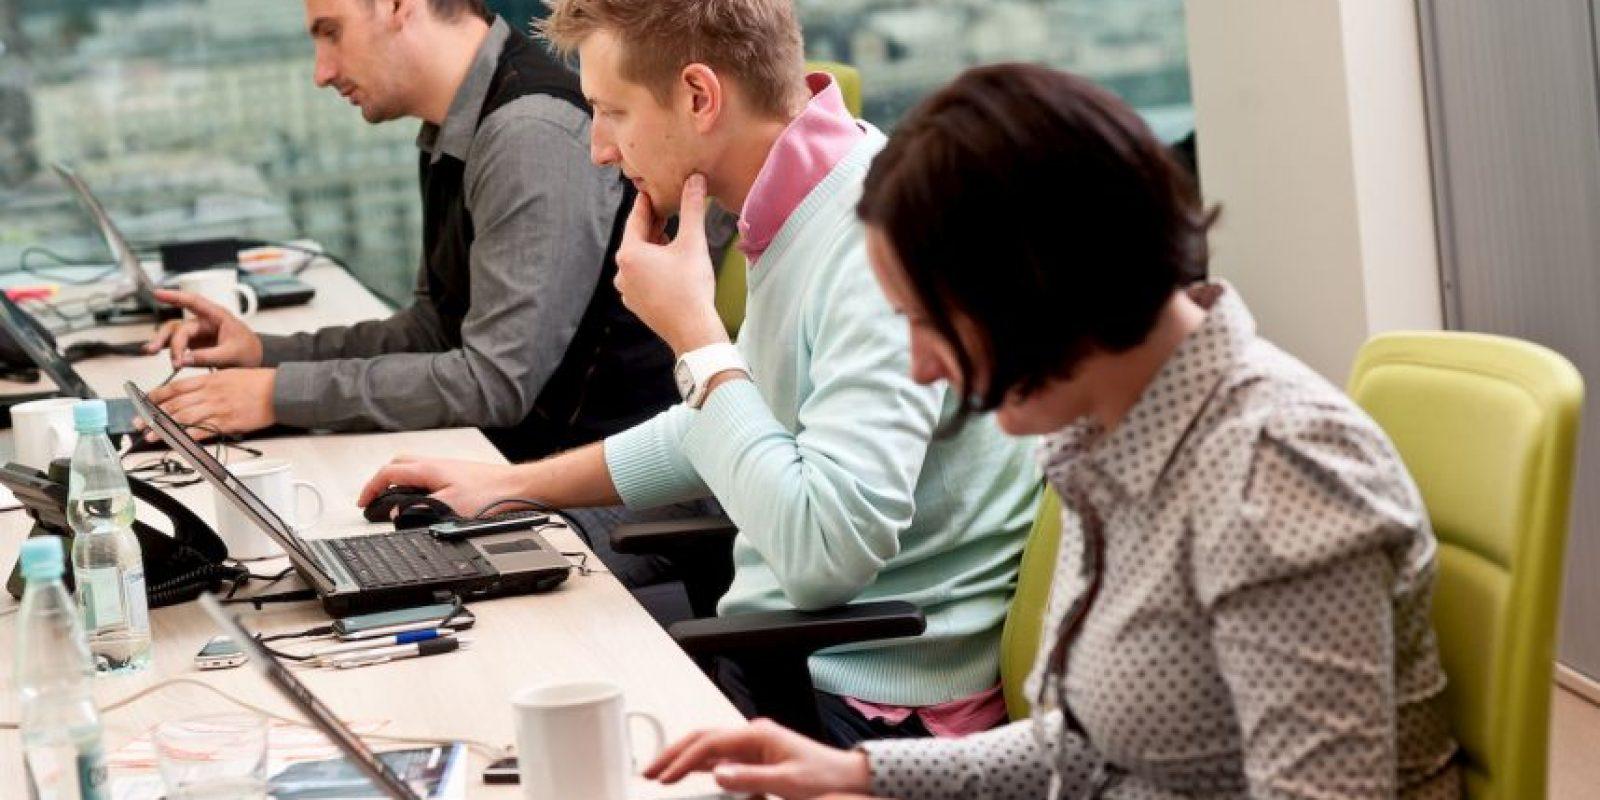 Estudio aconseja evitar el sedentarísmo Foto:Creative Commons / Kompania Piwowarska